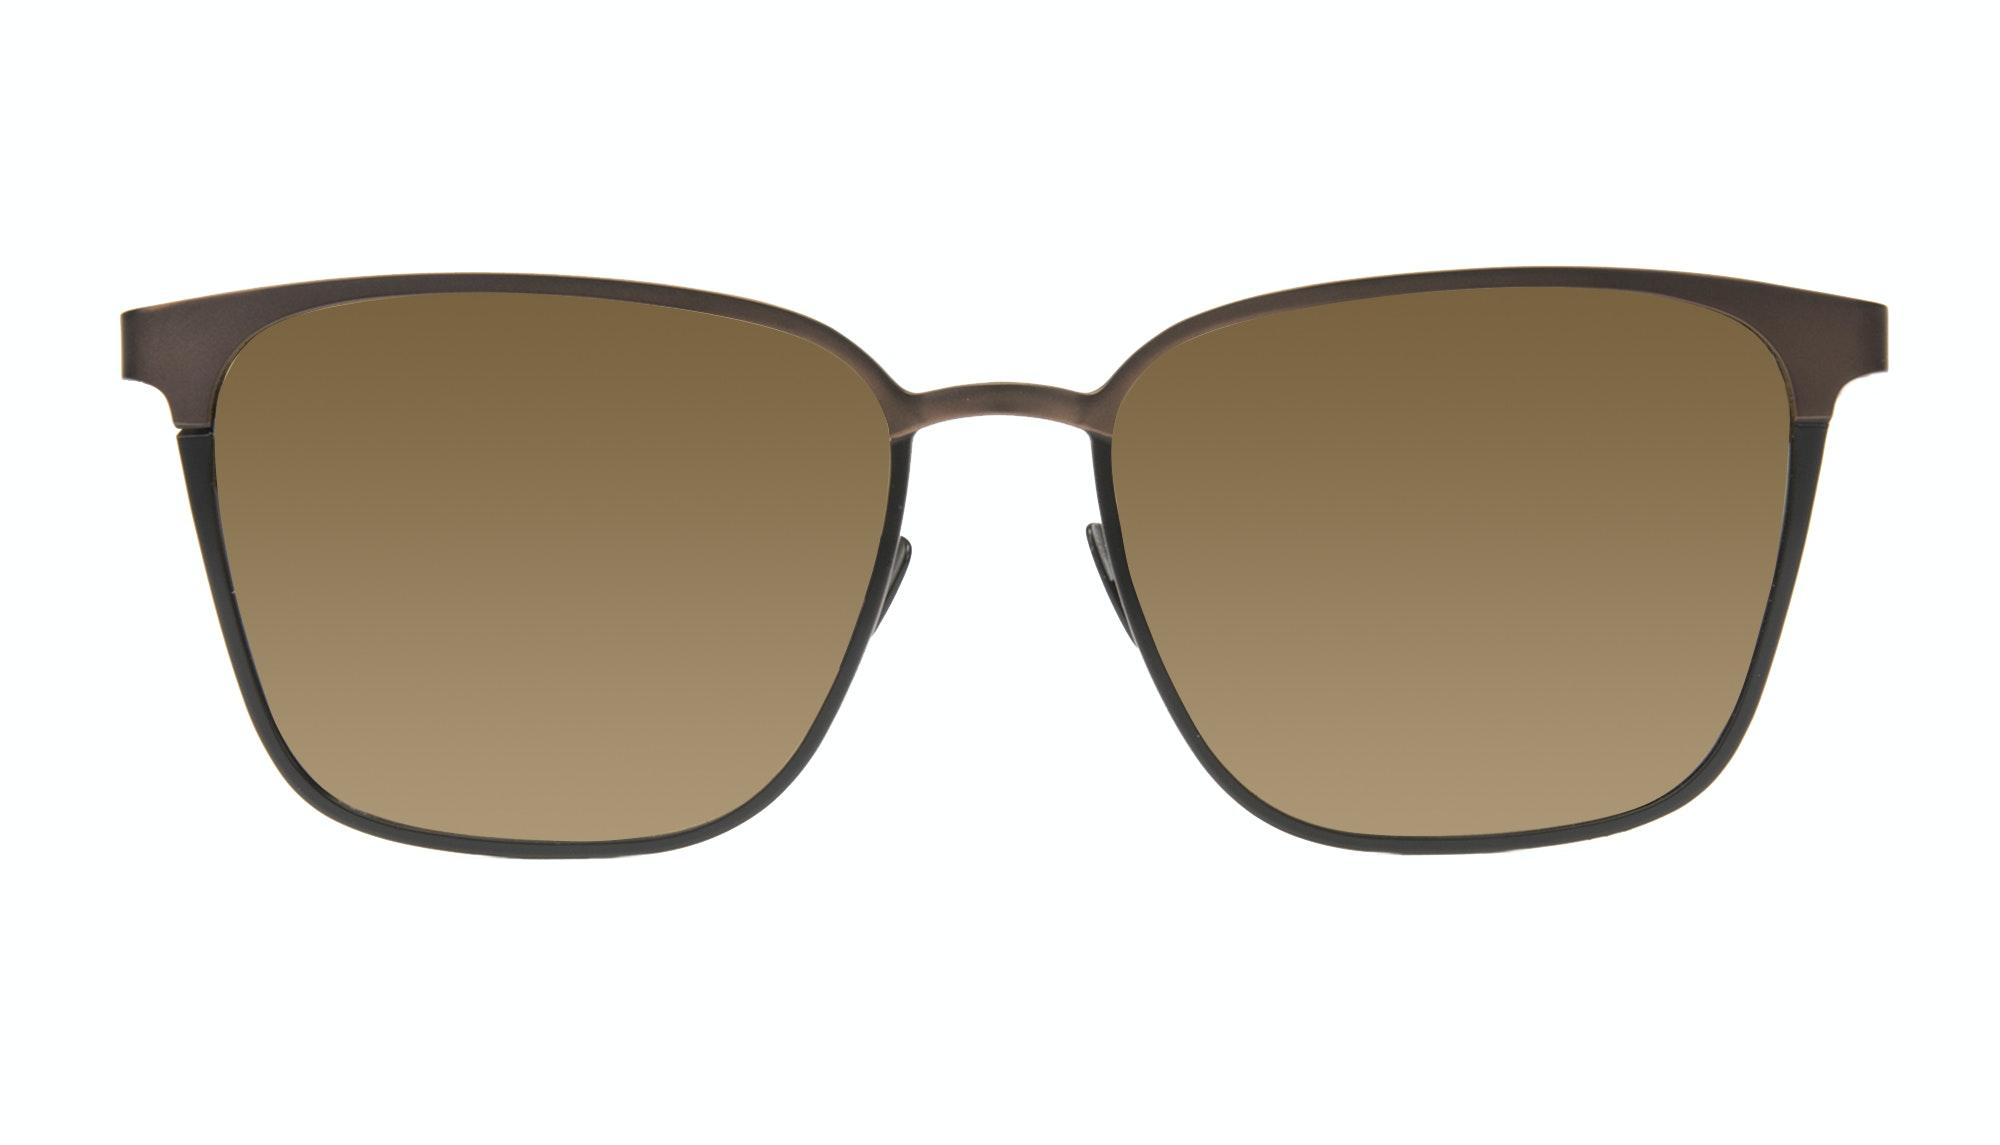 Affordable Fashion Glasses Rectangle Sunglasses Men Rove Deep Brown